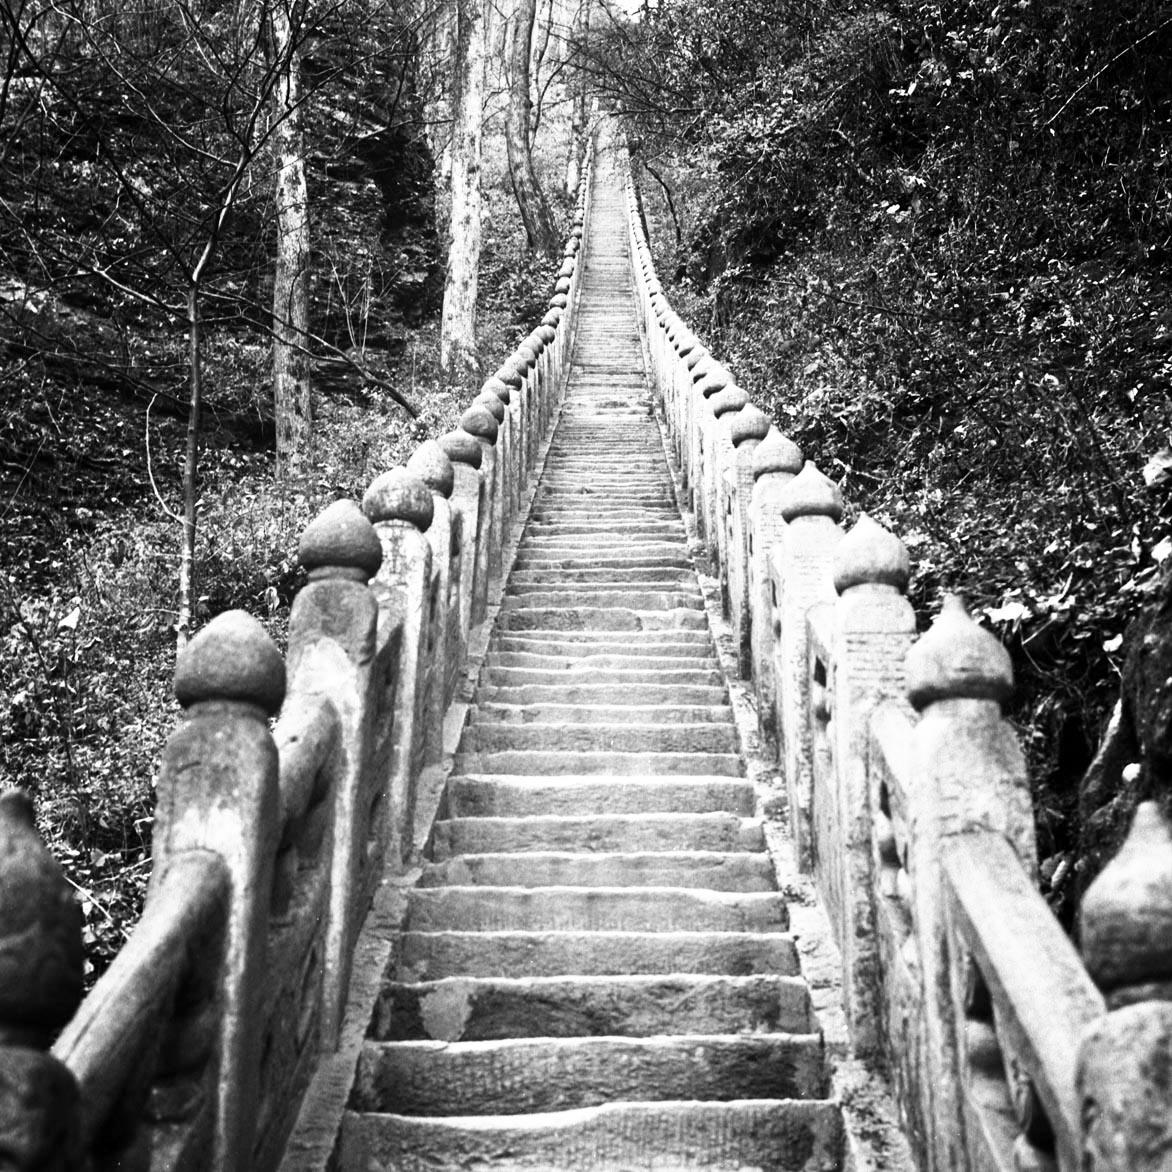 Stairway to heaven, Wudang Shan